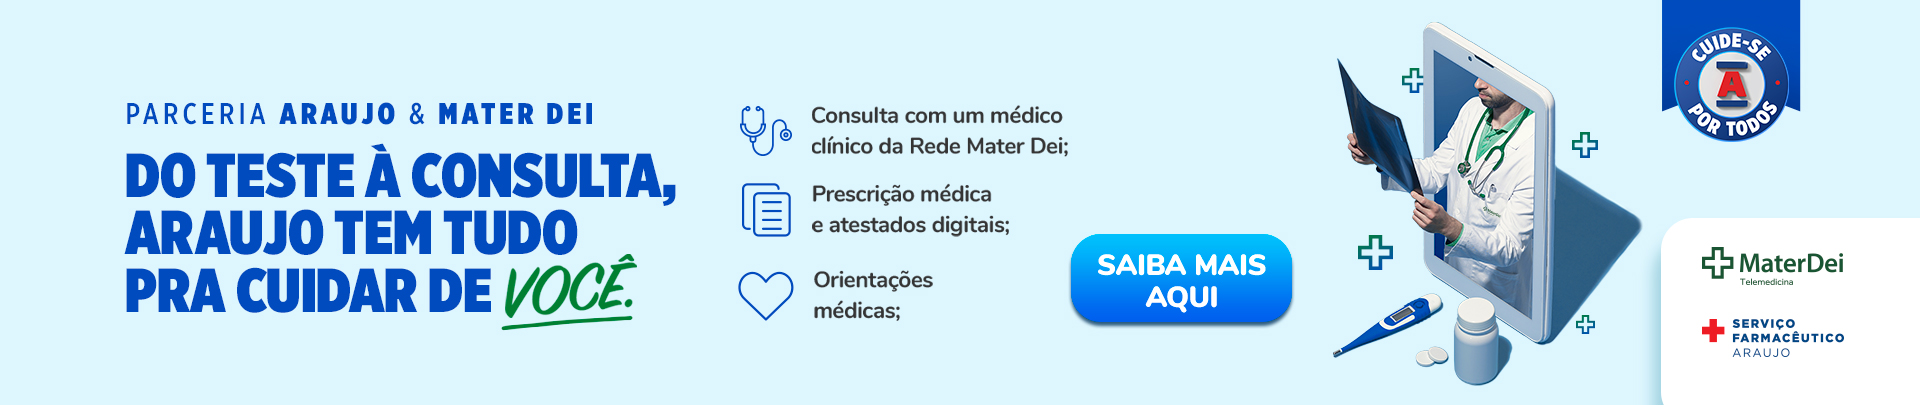 Telemedicina Mater Dei